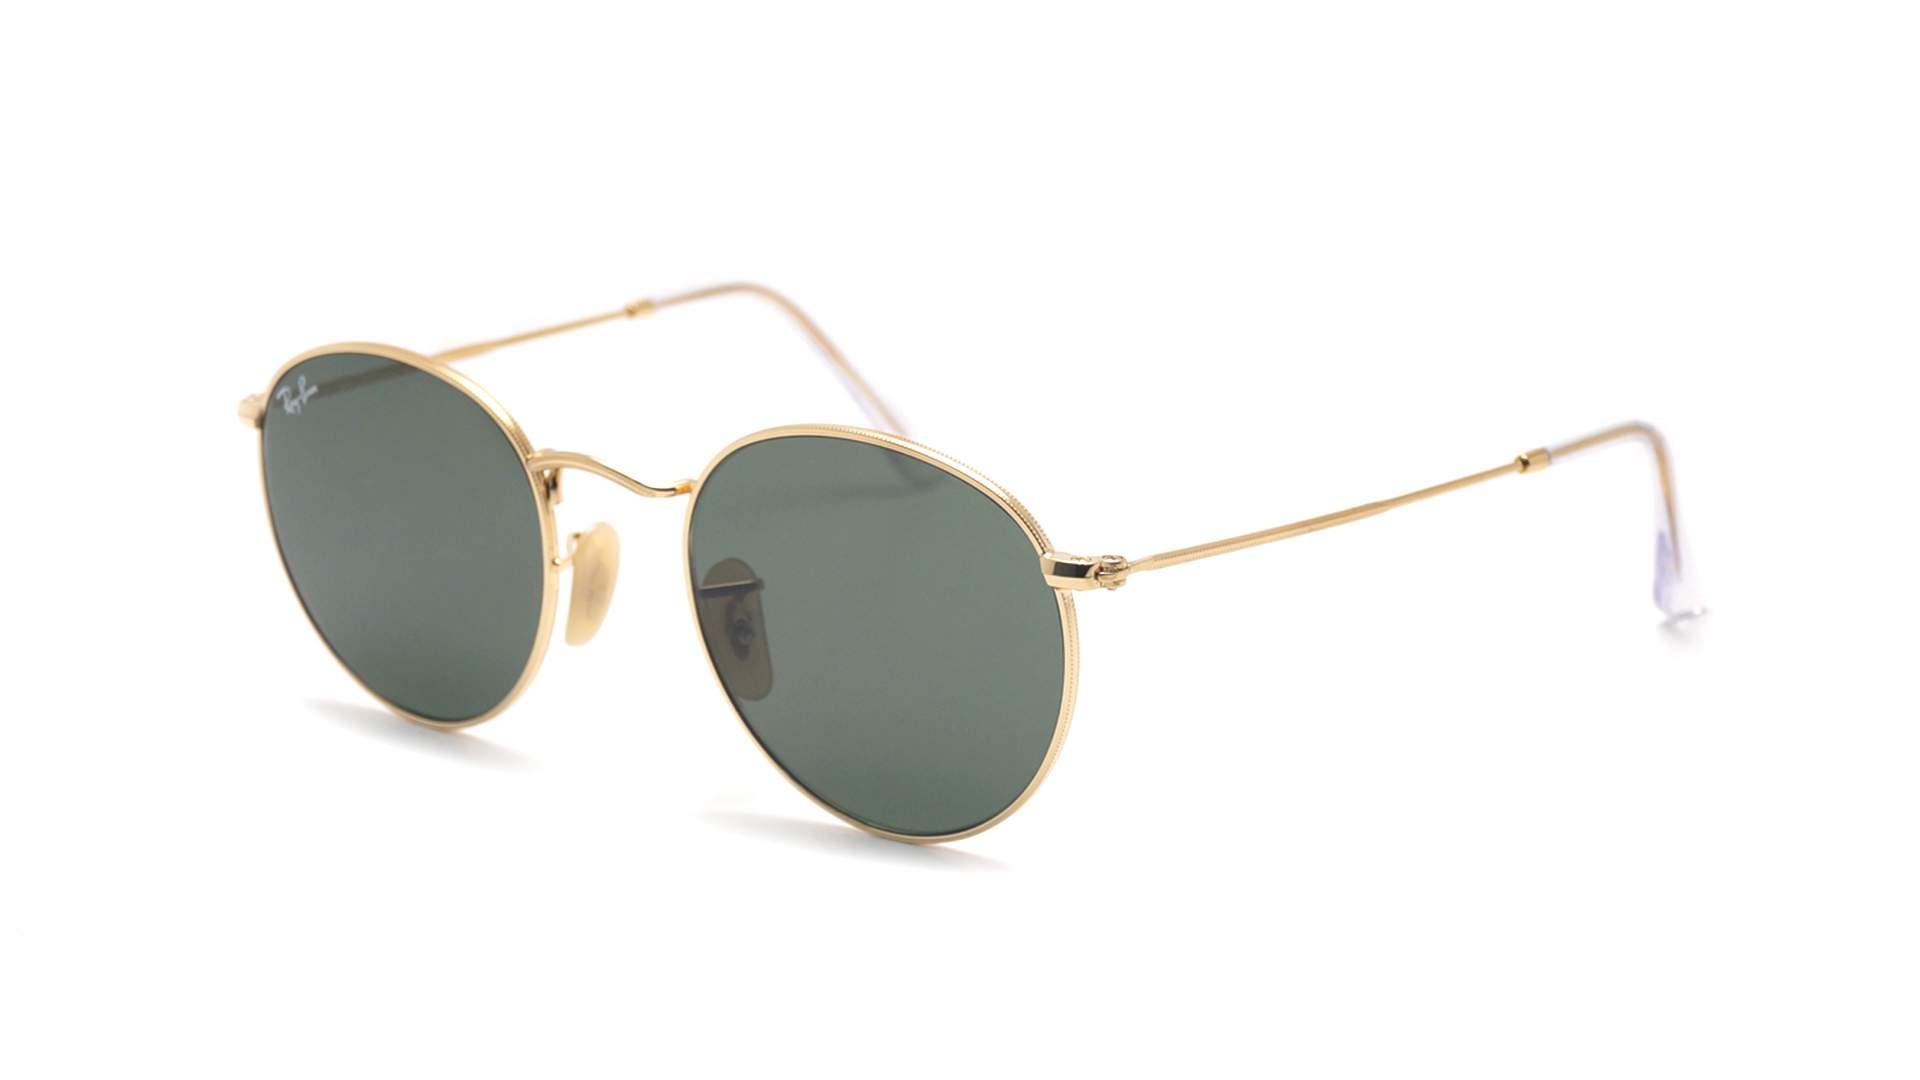 e6a55fda86f Sunglasses Ray-Ban Round Metal Flat LensesGold RB3447N 001 50-21 Medium